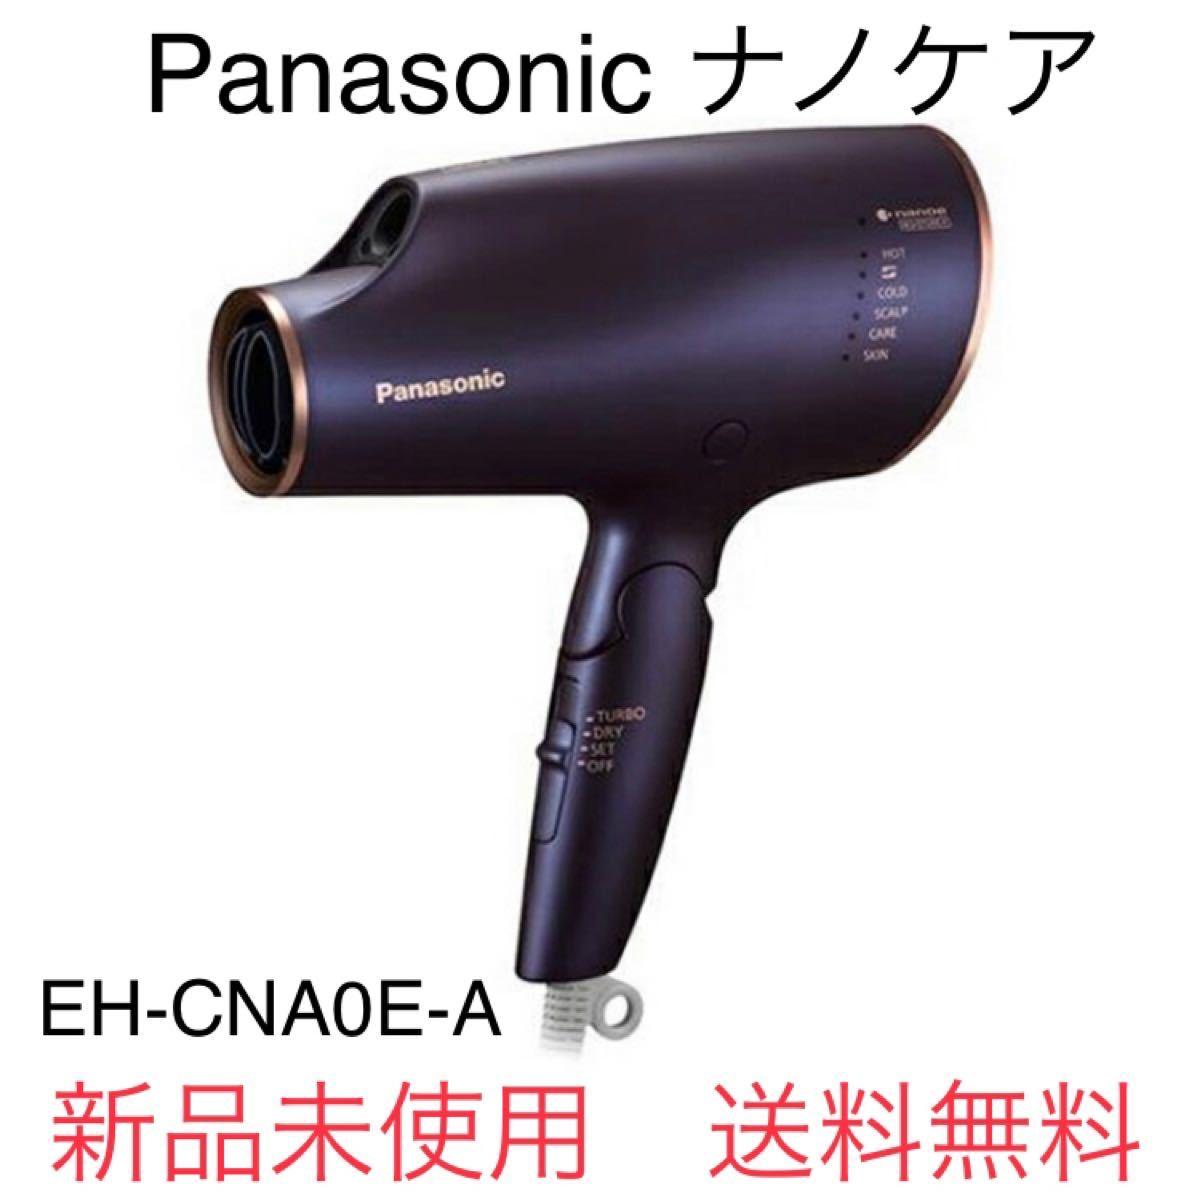 Panasonic パナソニック EH-CNA0E-A ヘアードライヤー ナノケア 新品未使用 送料無料